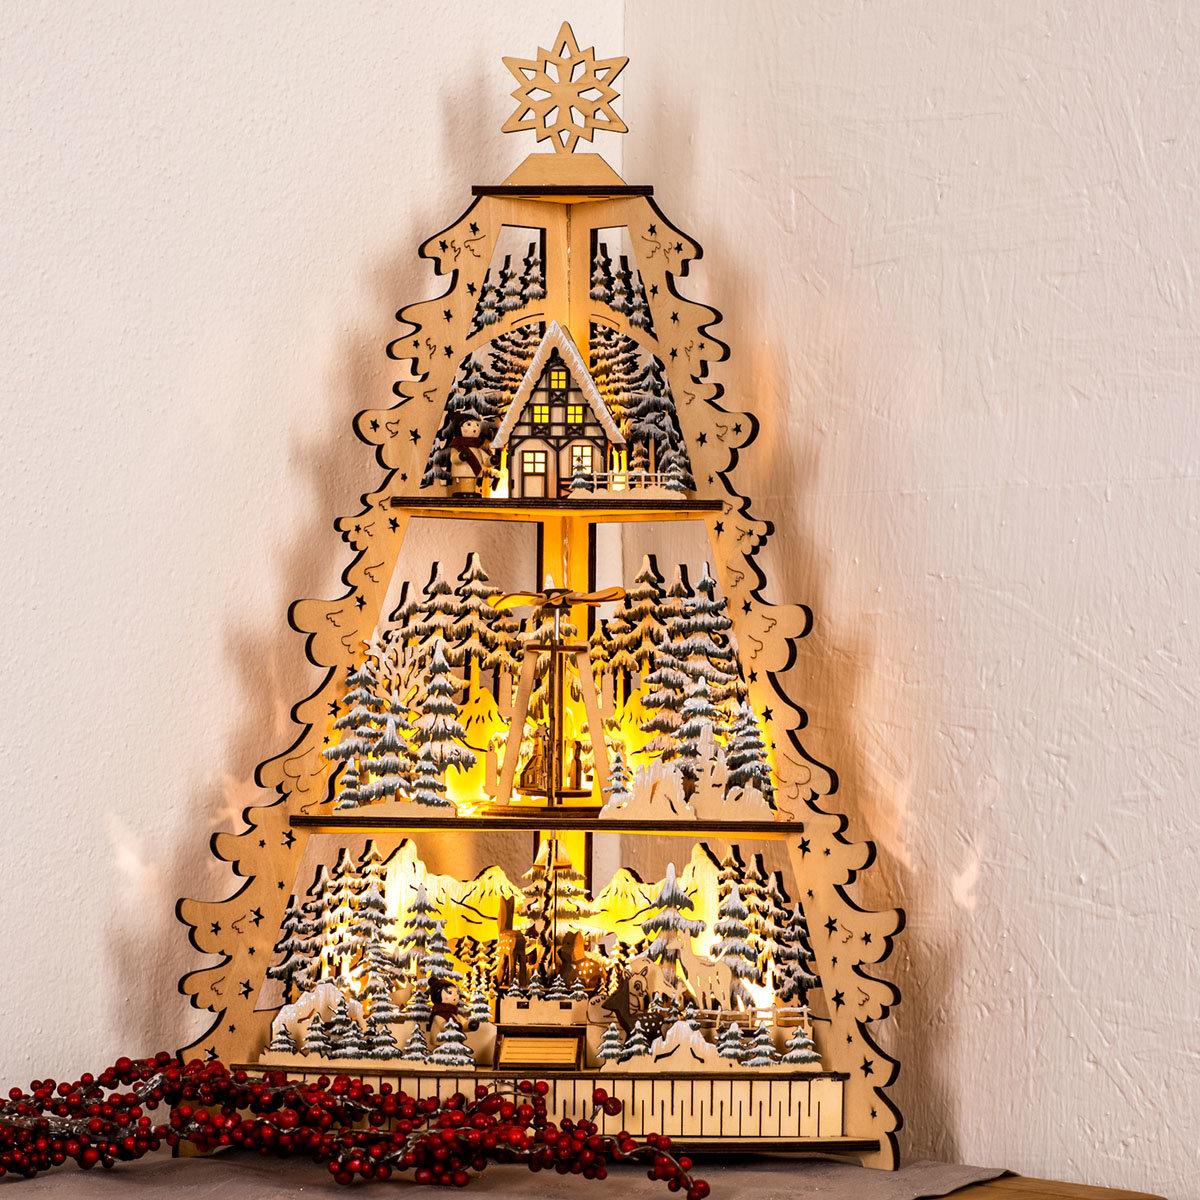 3D Weihnachtsberg mit LED-Beleuchtung